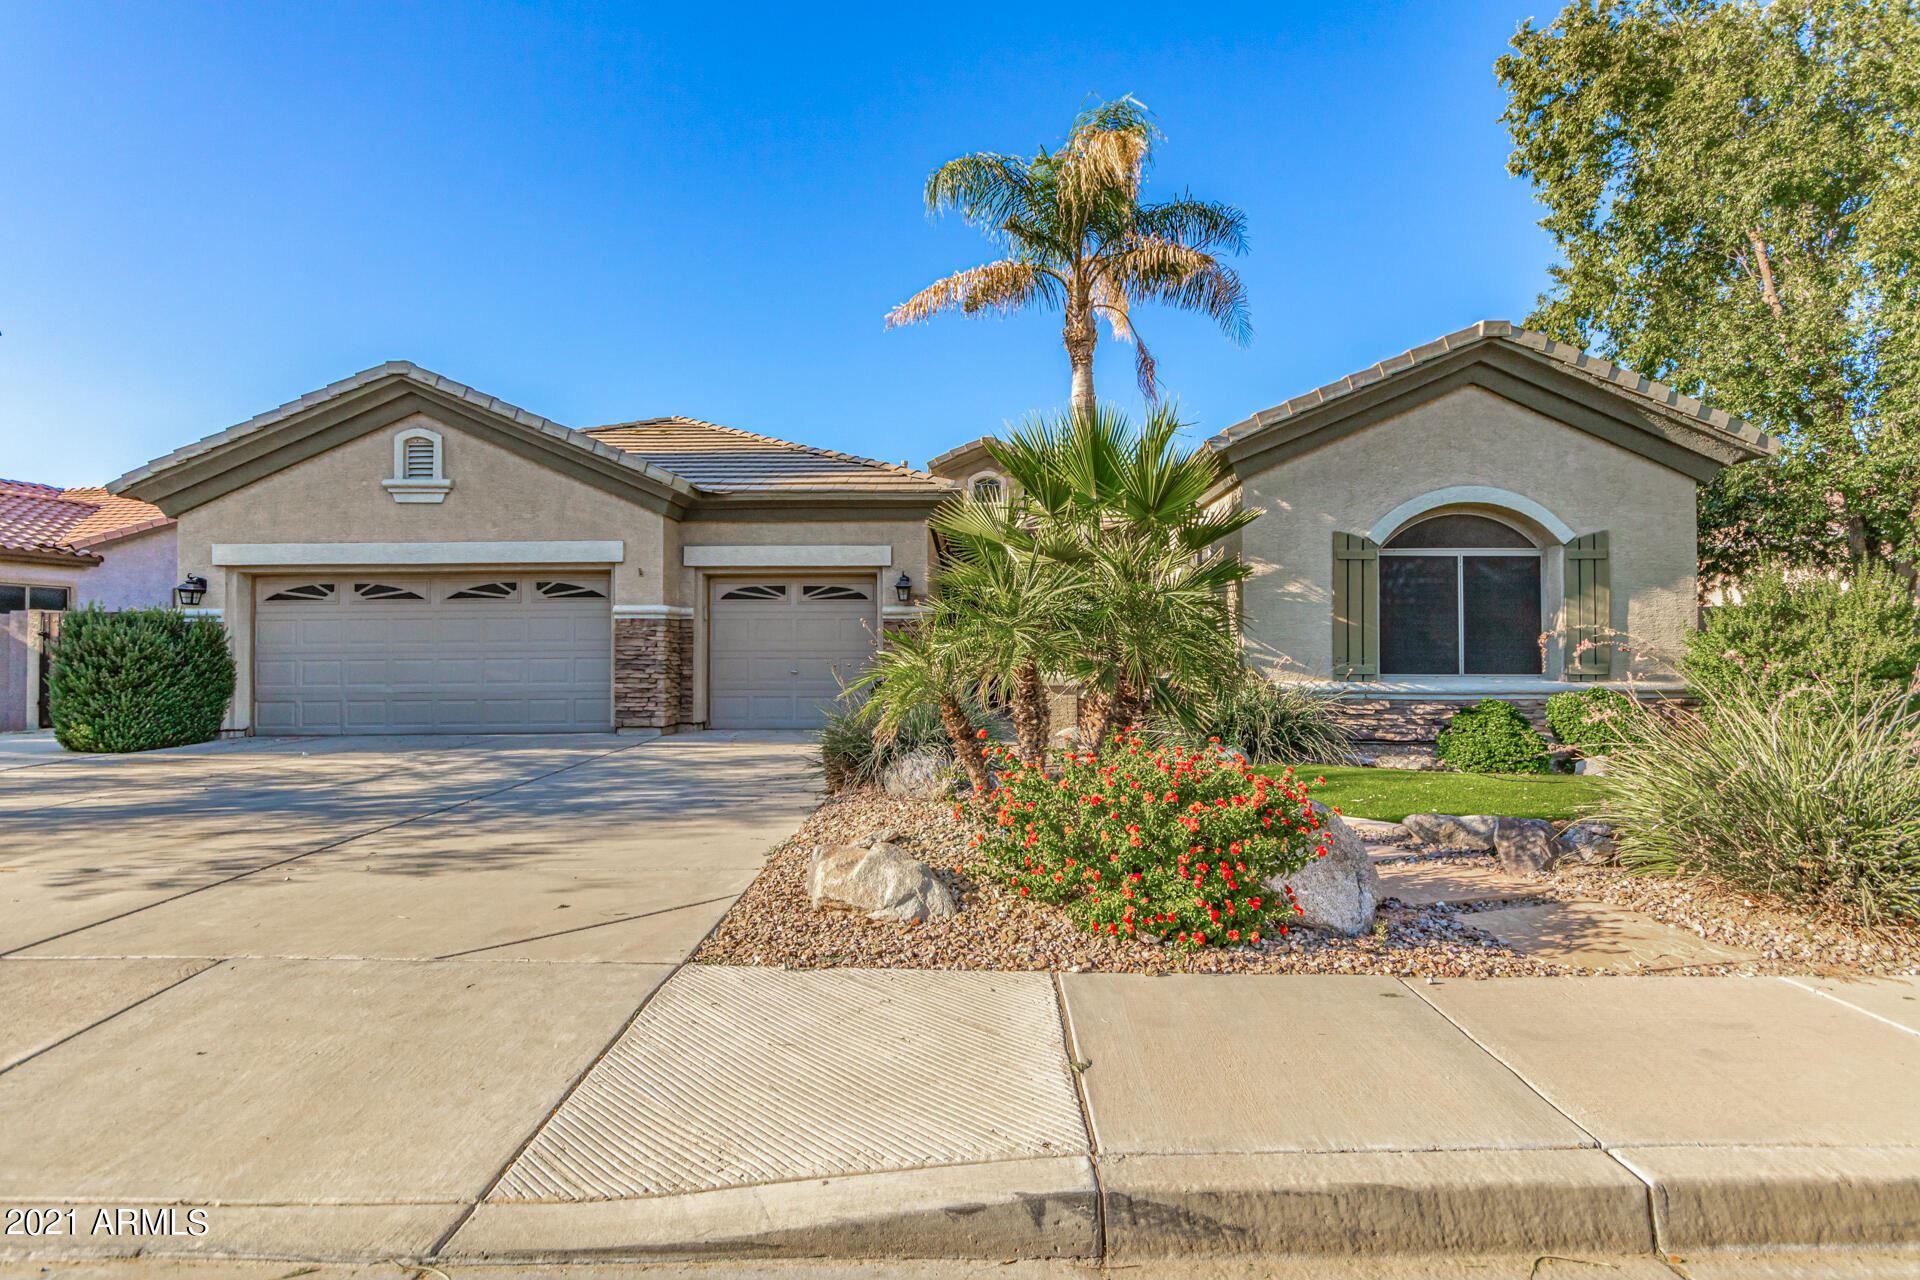 Photo of 2570 E HAZELTINE Way, Chandler, AZ 85249 (MLS # 6307721)